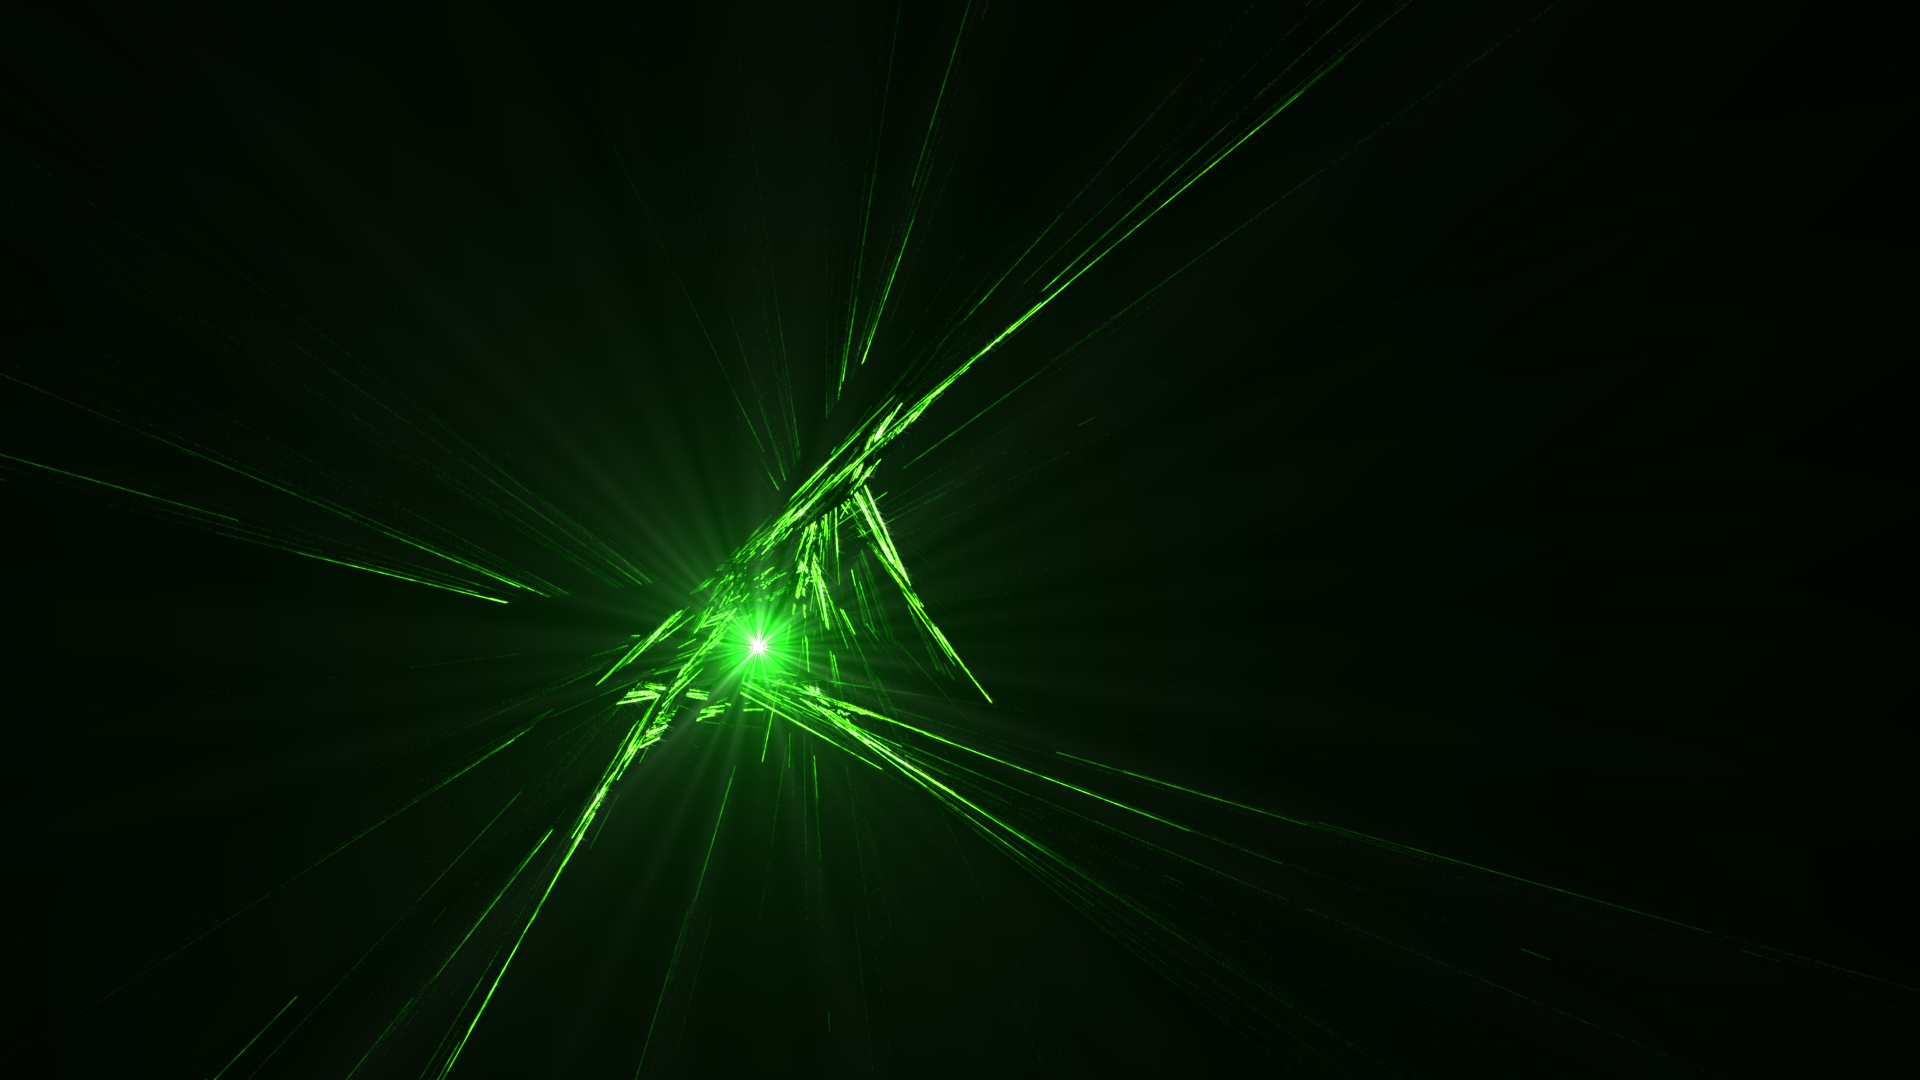 Download Wallpaper High Resolution Green - XLZHeQ  Snapshot_268484.jpg